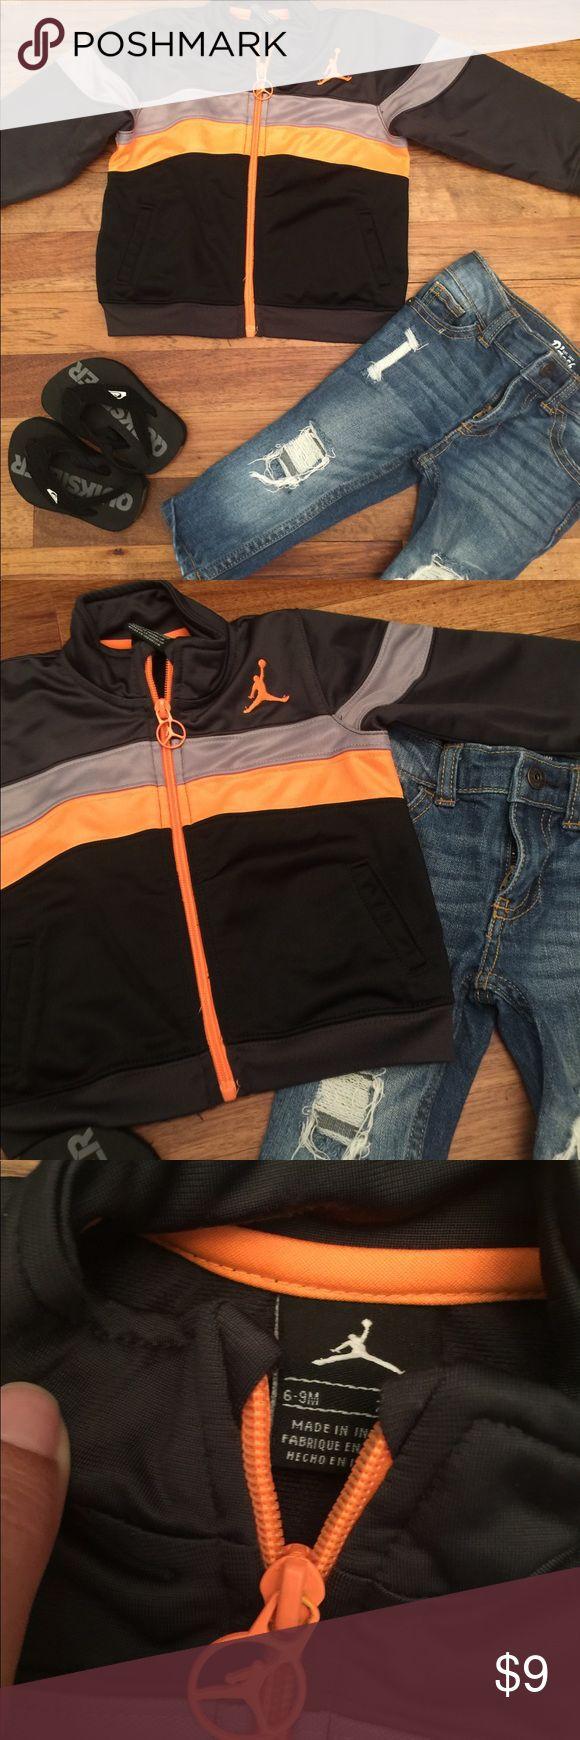 Black orange and grey Jordan jacket Very nice condition, jacket for baby. Jordan Jackets & Coats